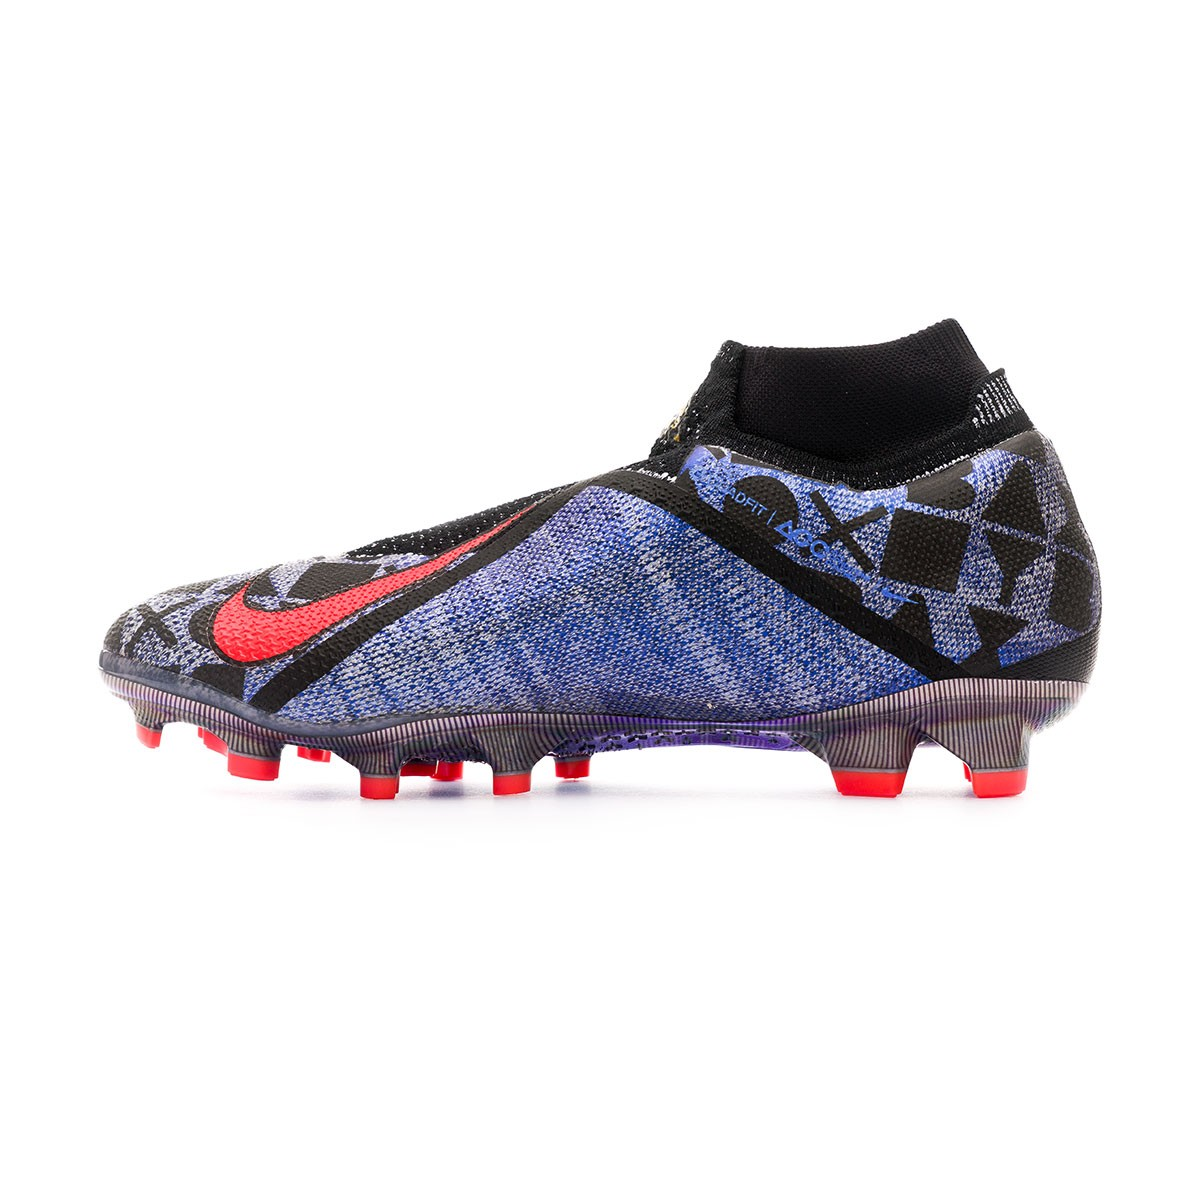 8062854a9 Football Boots Nike Phantom Vision Elite DF FG EA Sports White-Black-Bright  crimson - Football store Fútbol Emotion